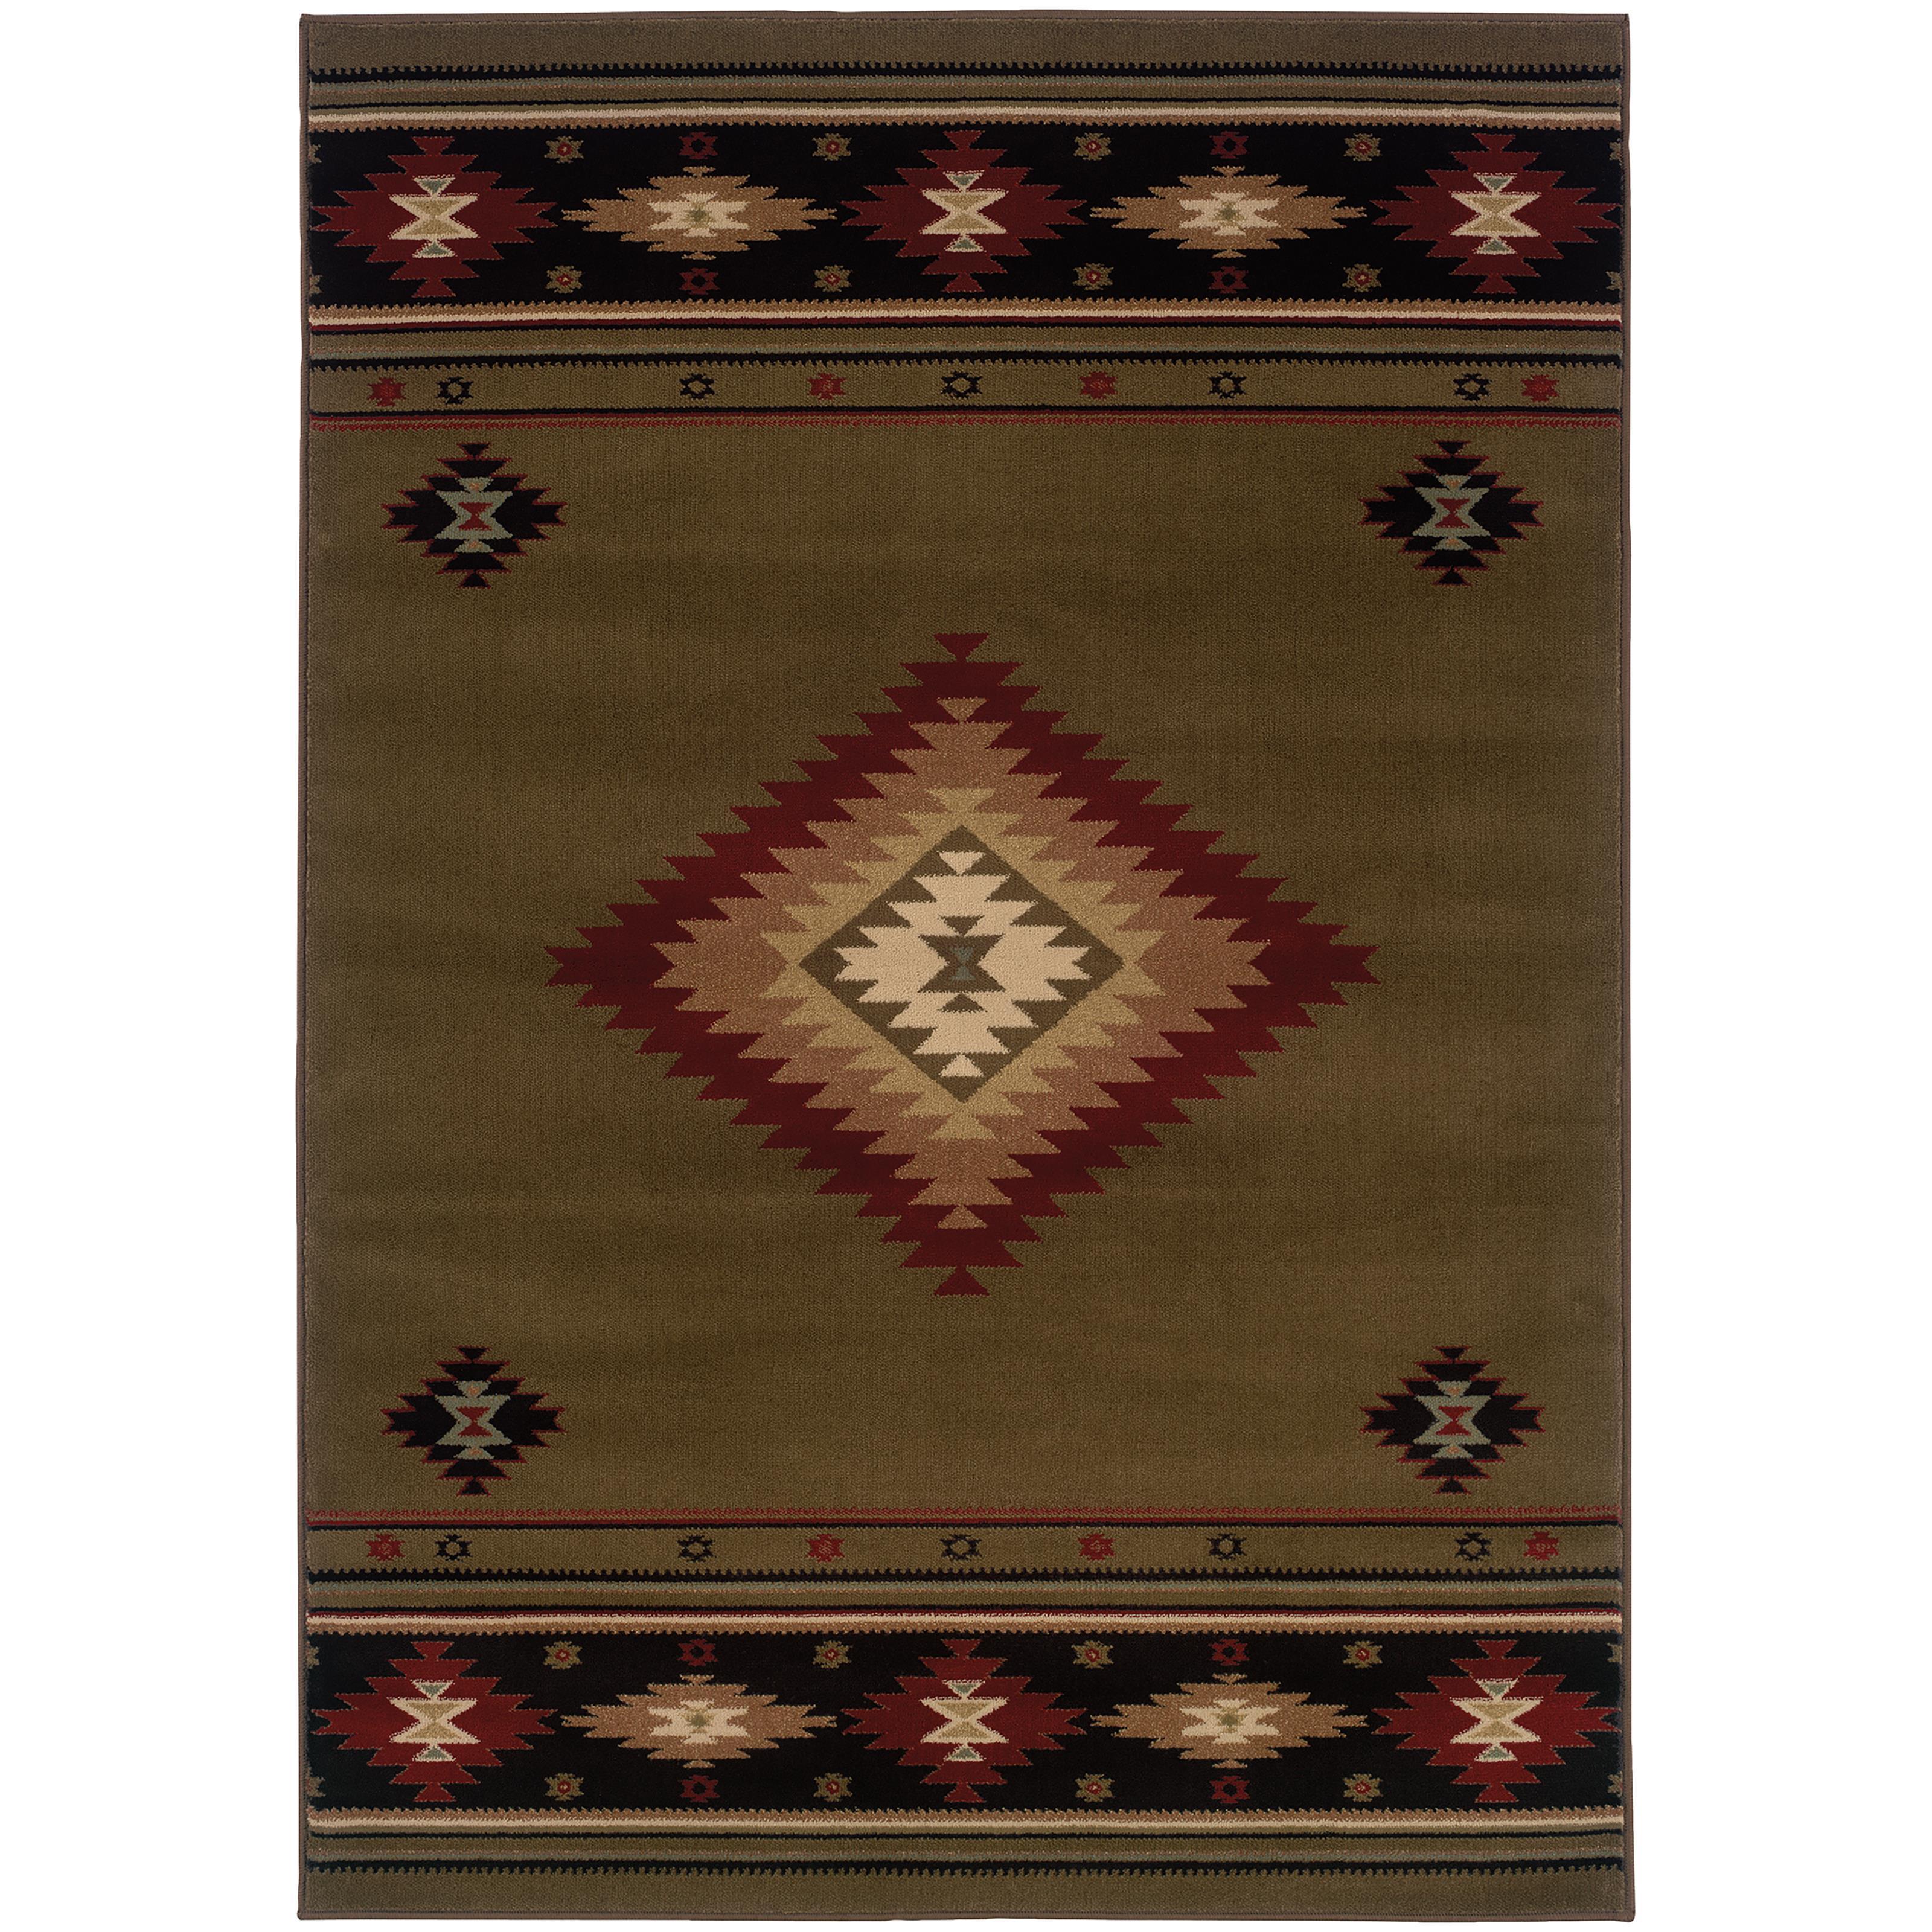 Oriental Weavers Hudson 10' X 13' Rug - Item Number: H087J1305396ST